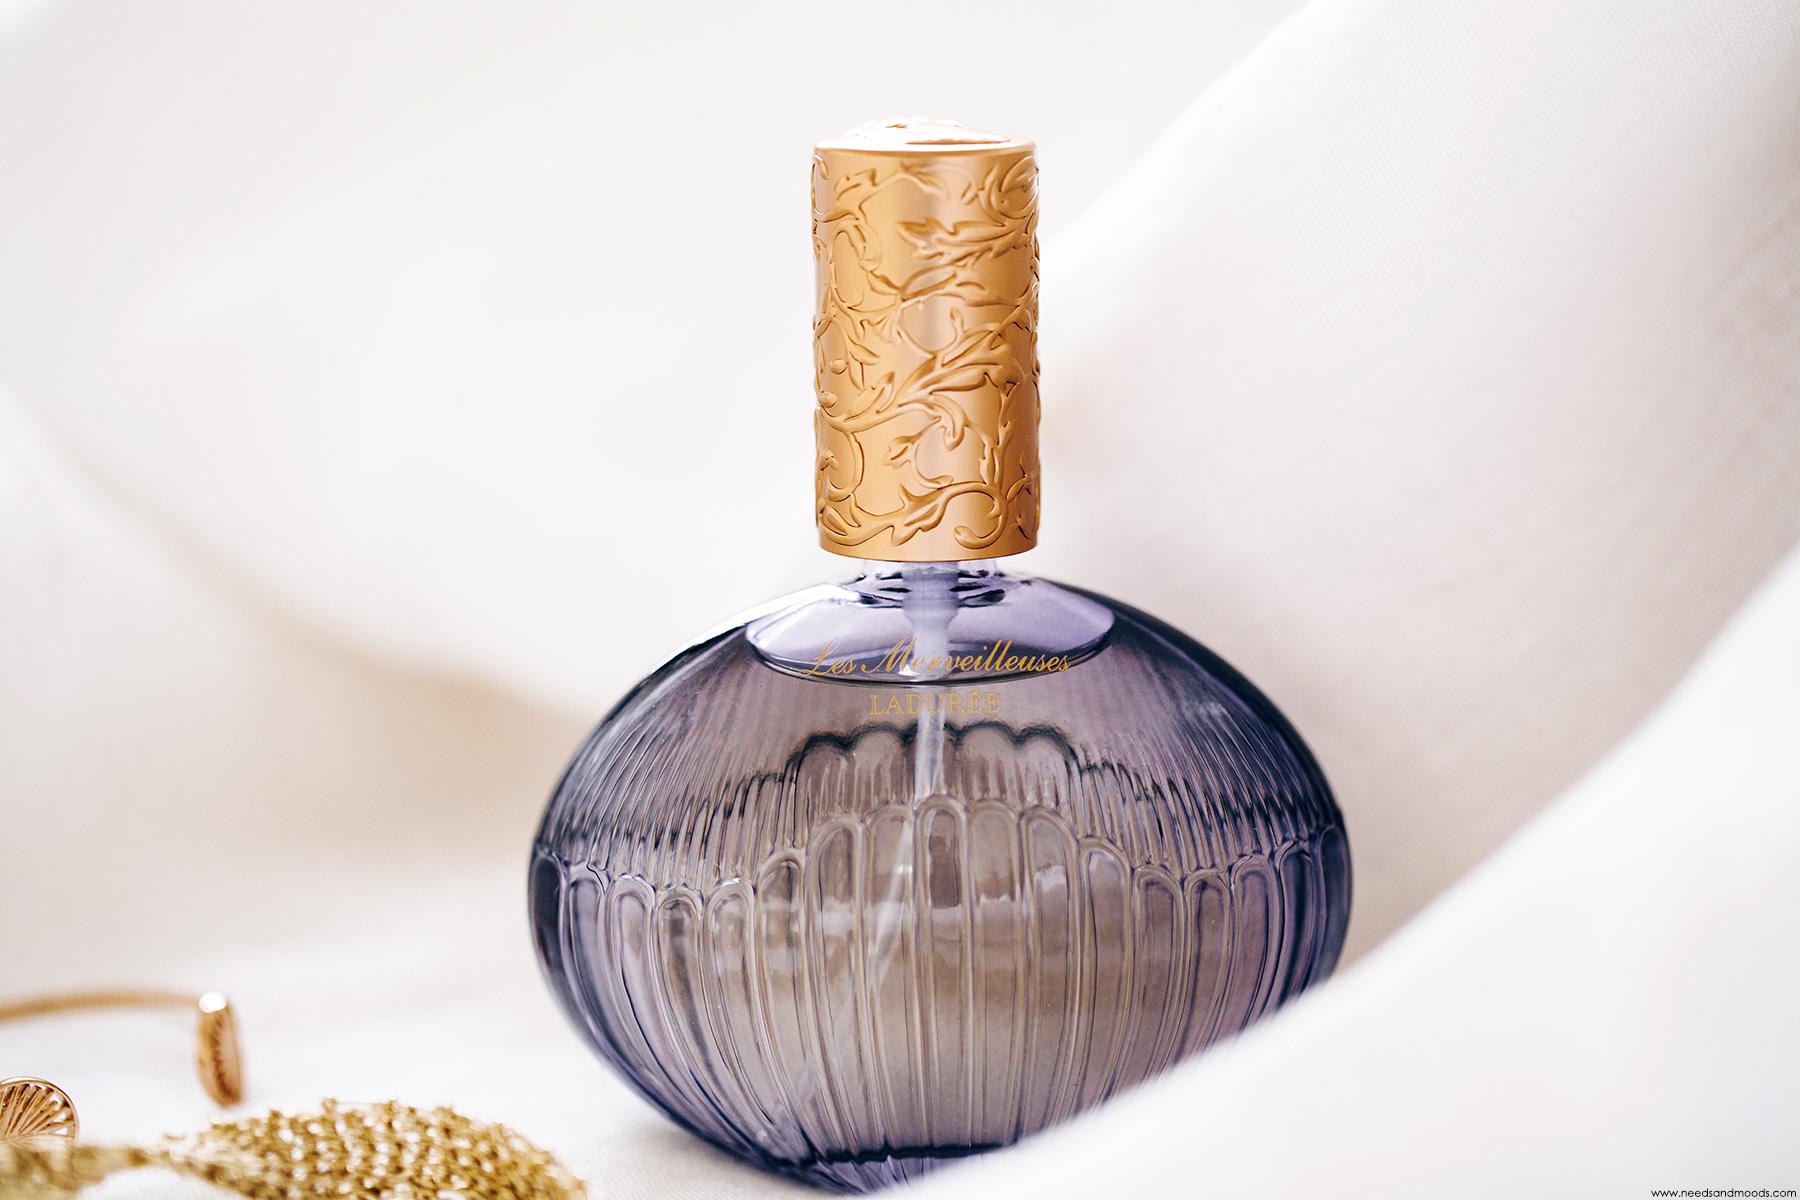 les merveilleuses laduree eau parfum merveilleuse avis